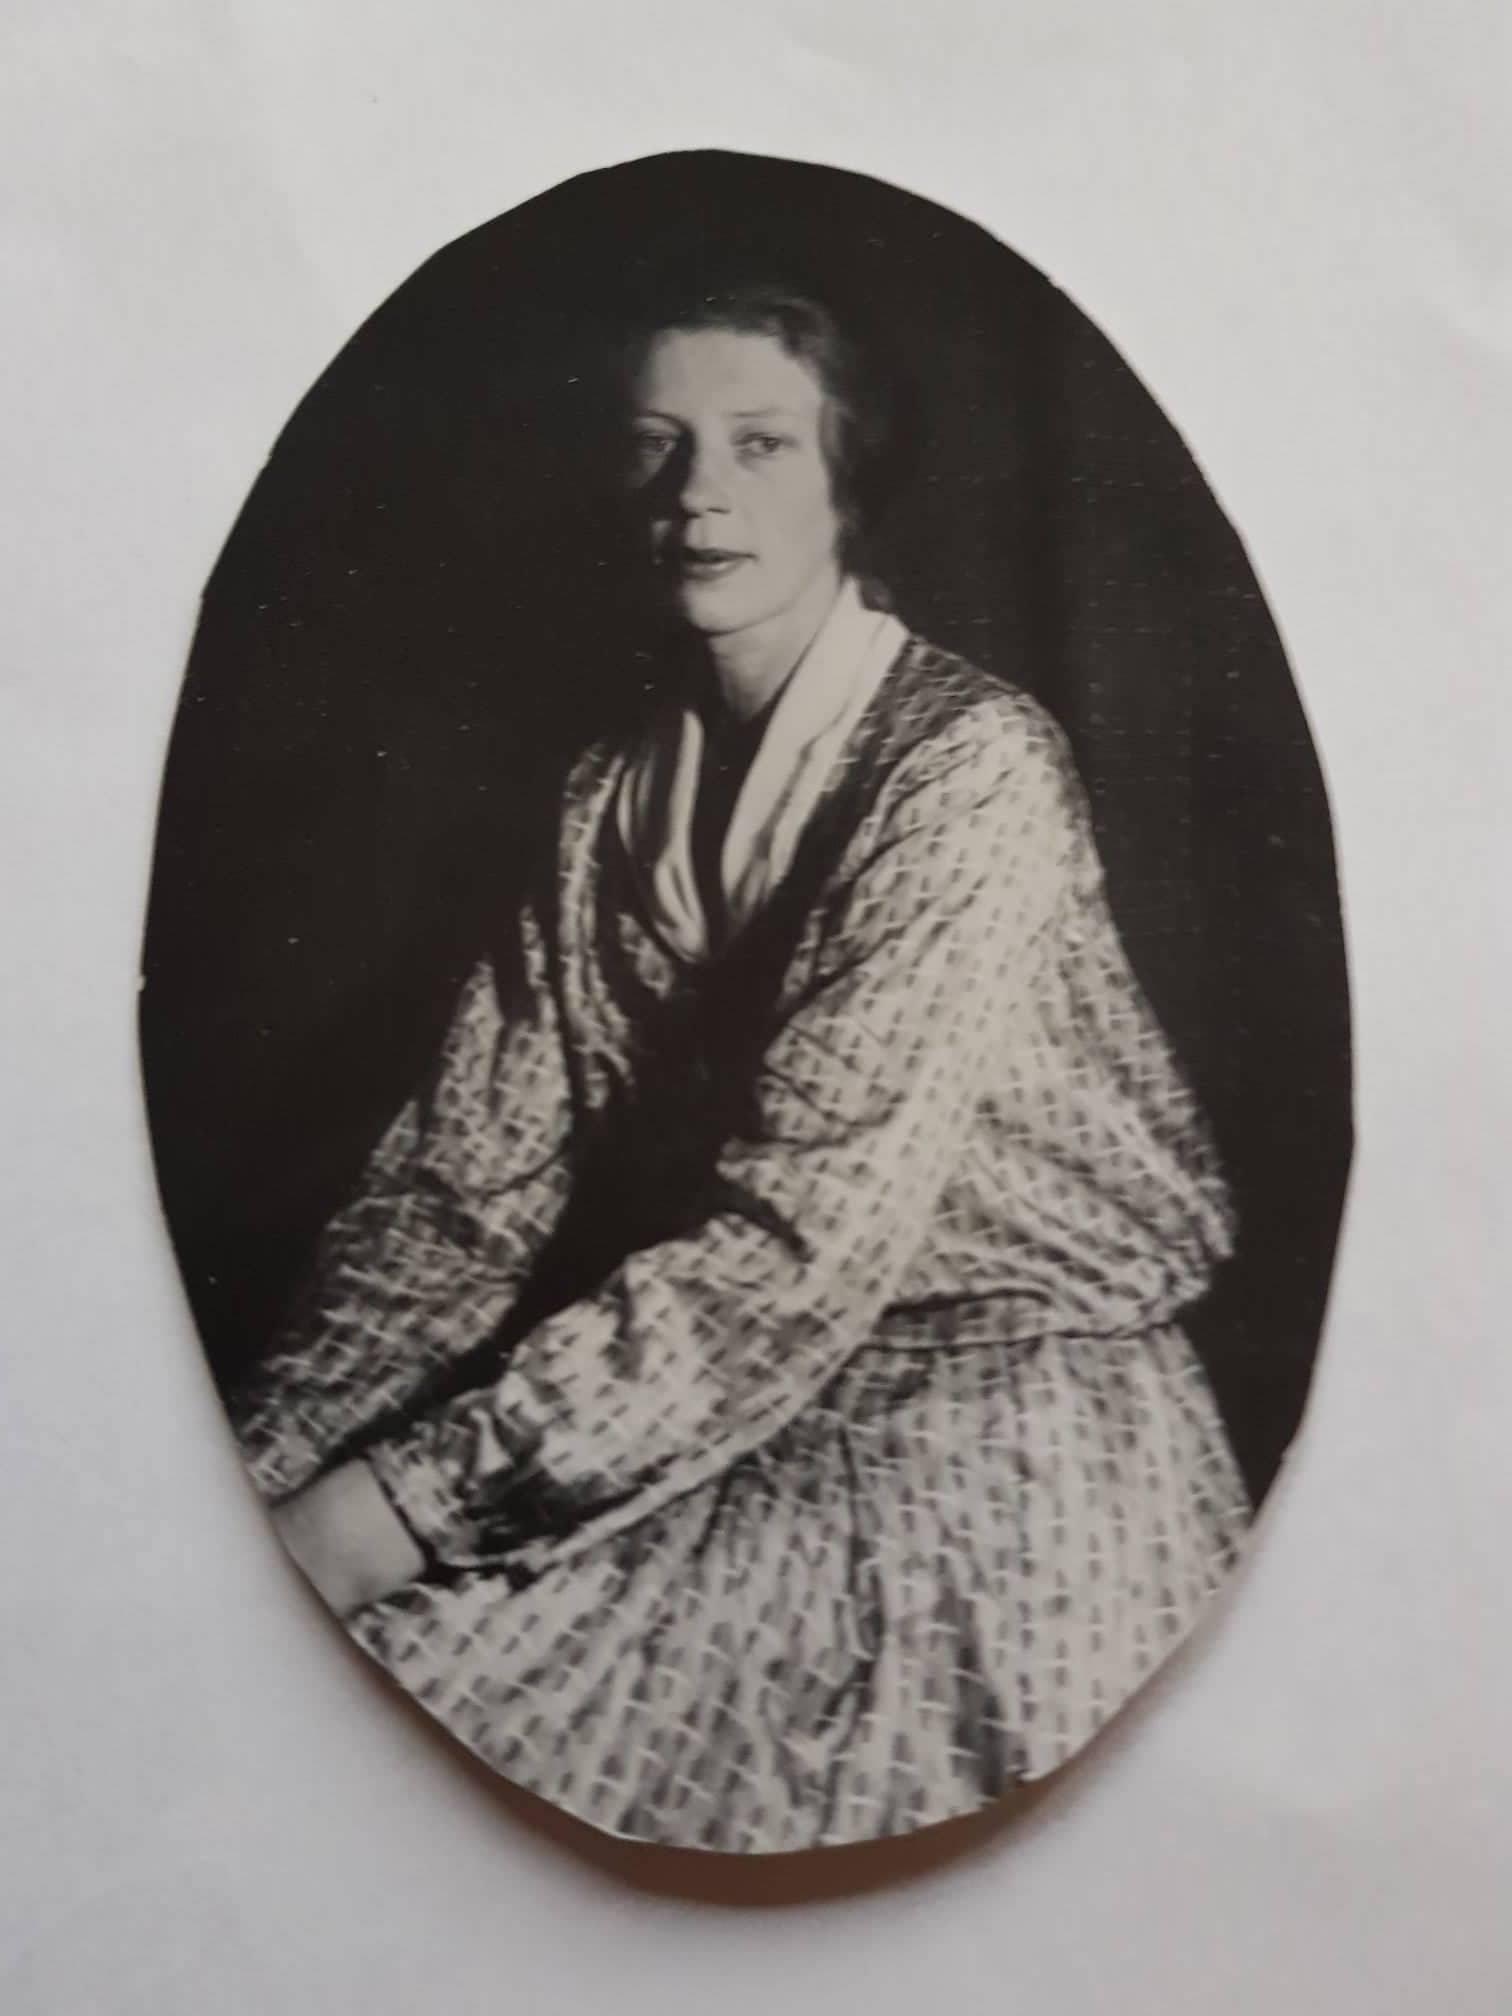 Hela Katterfeld, Geborene Baronesse Düsterloh *11.11 1900,+18.11.1964